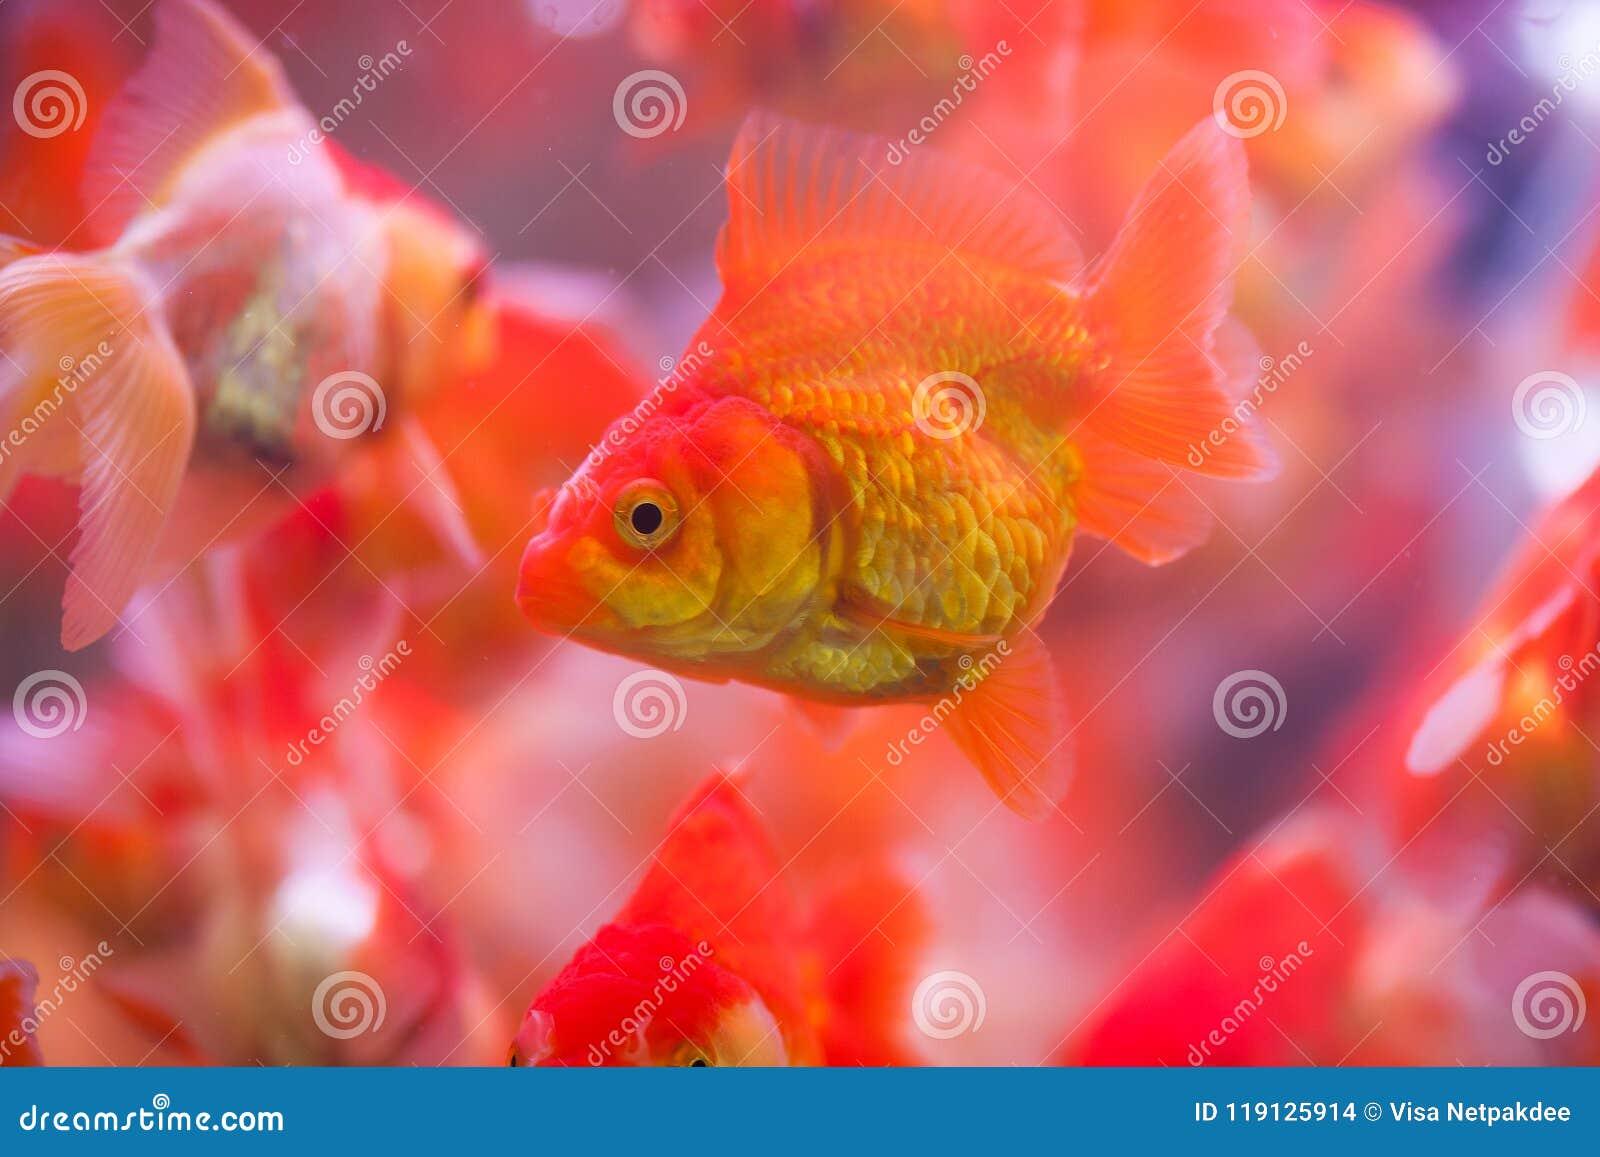 Goldfish sucks a rocks